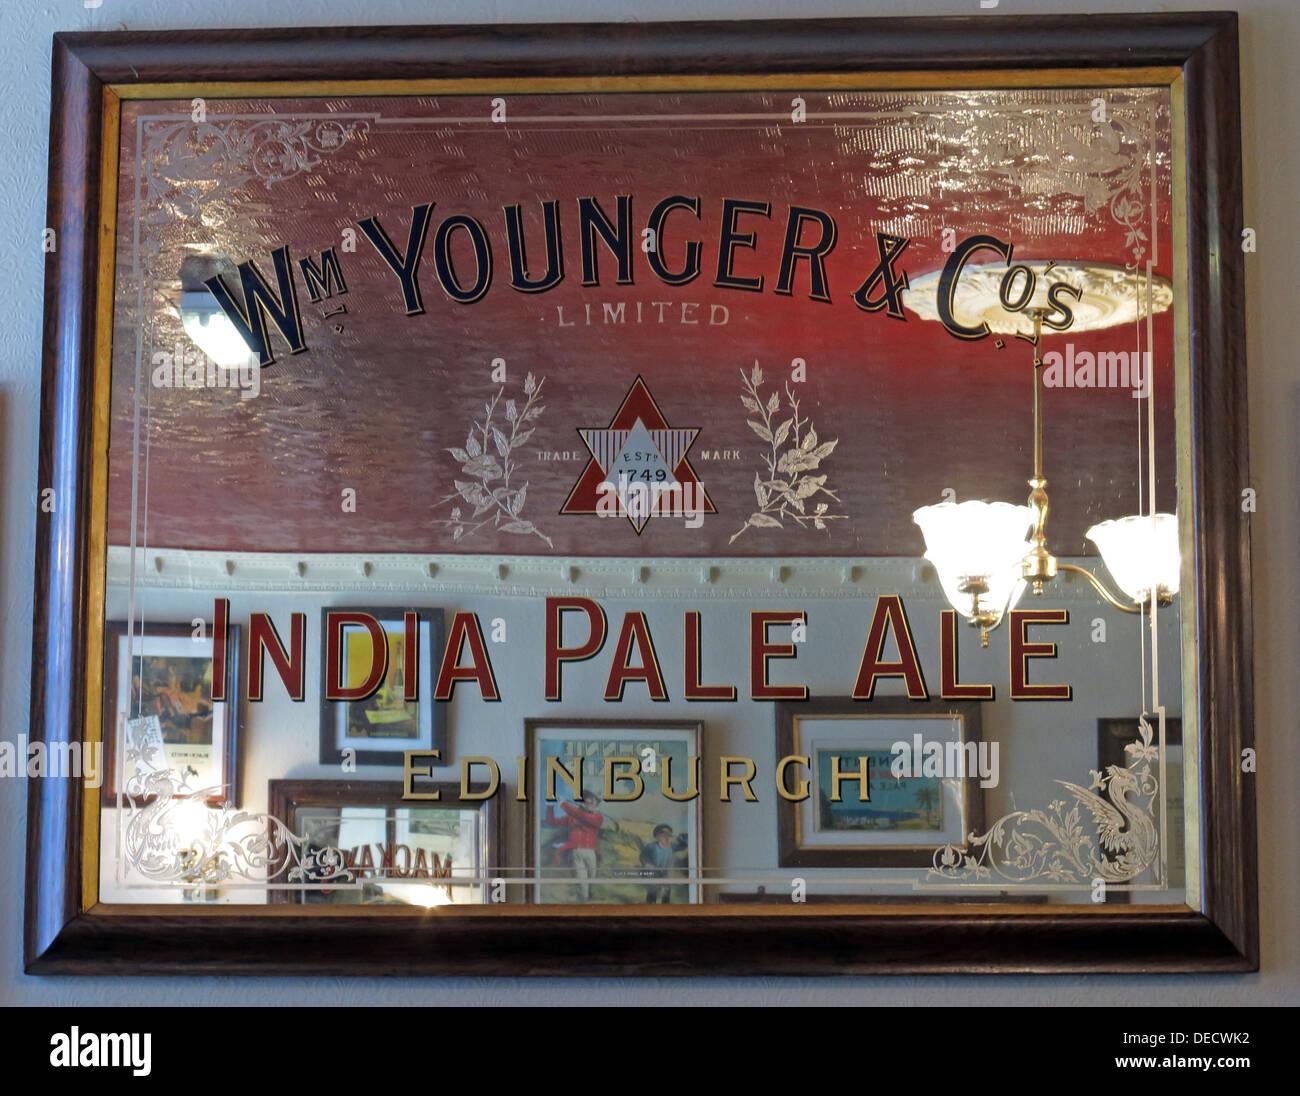 Wm Younger & Cos India Pale Ale mirror, Bow bar, Edinburgh, Scotland, UK Stock Photo